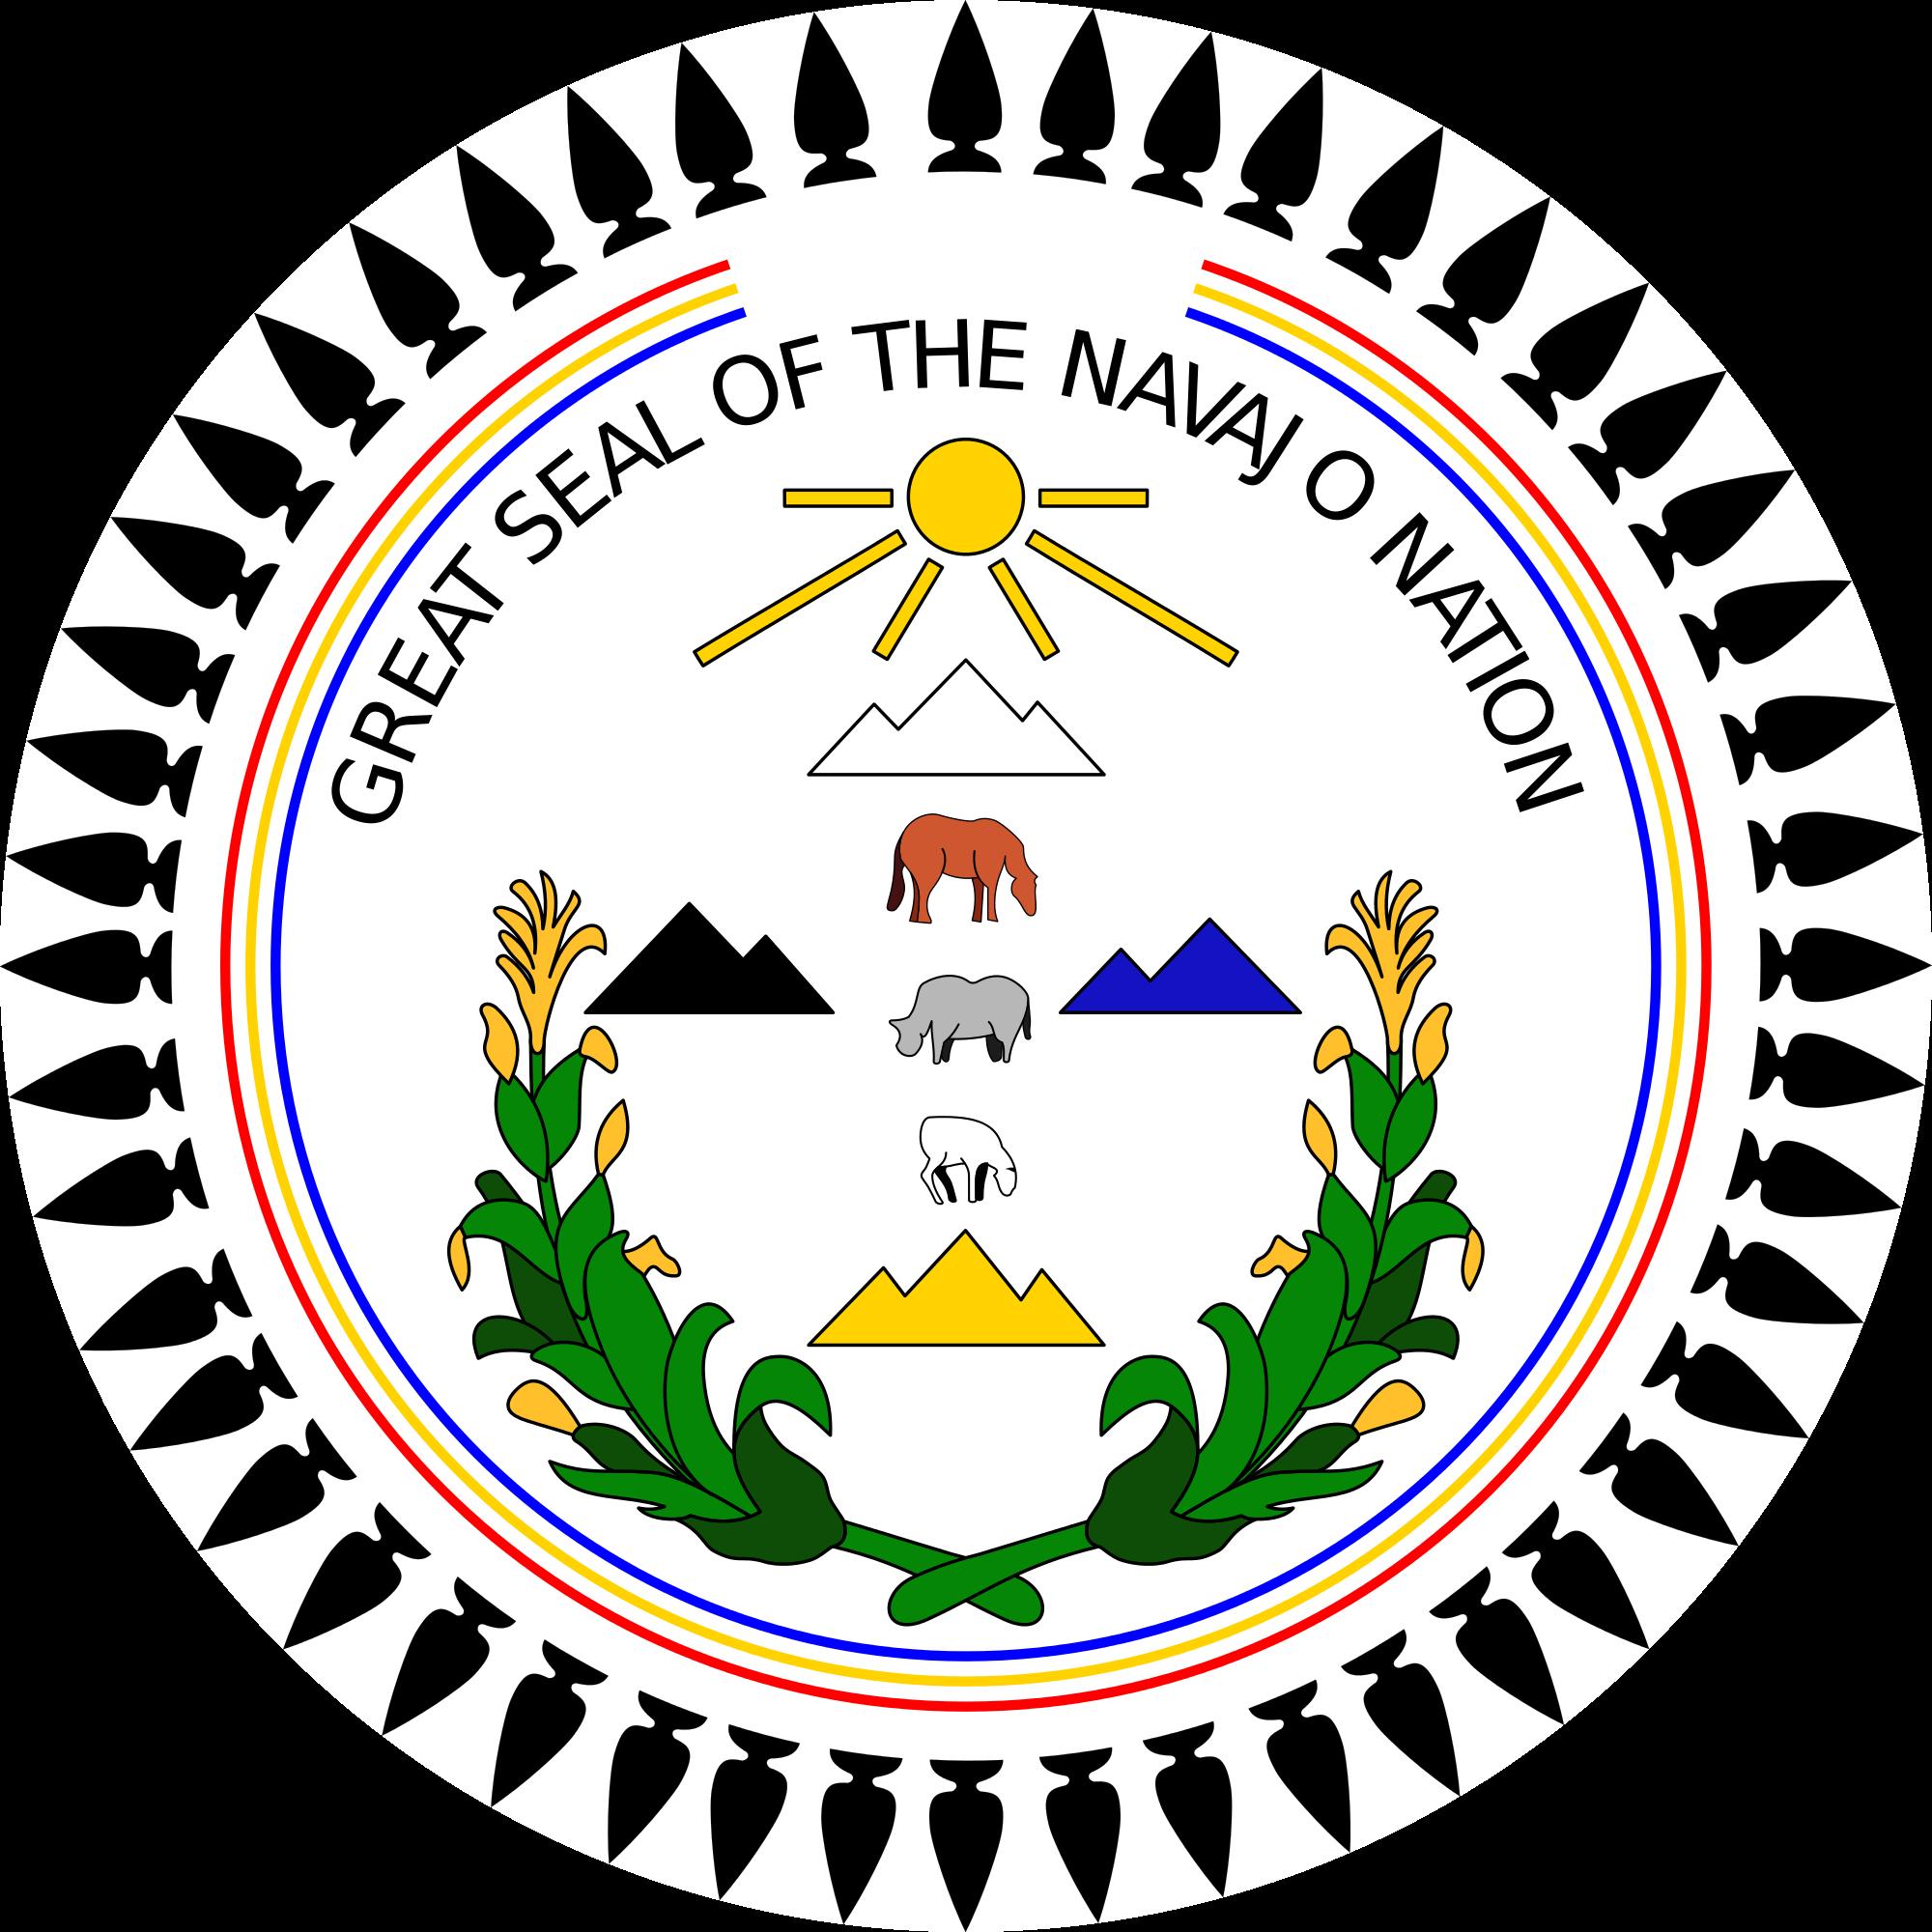 NAVAJO Navajo, Stemma, Crimine